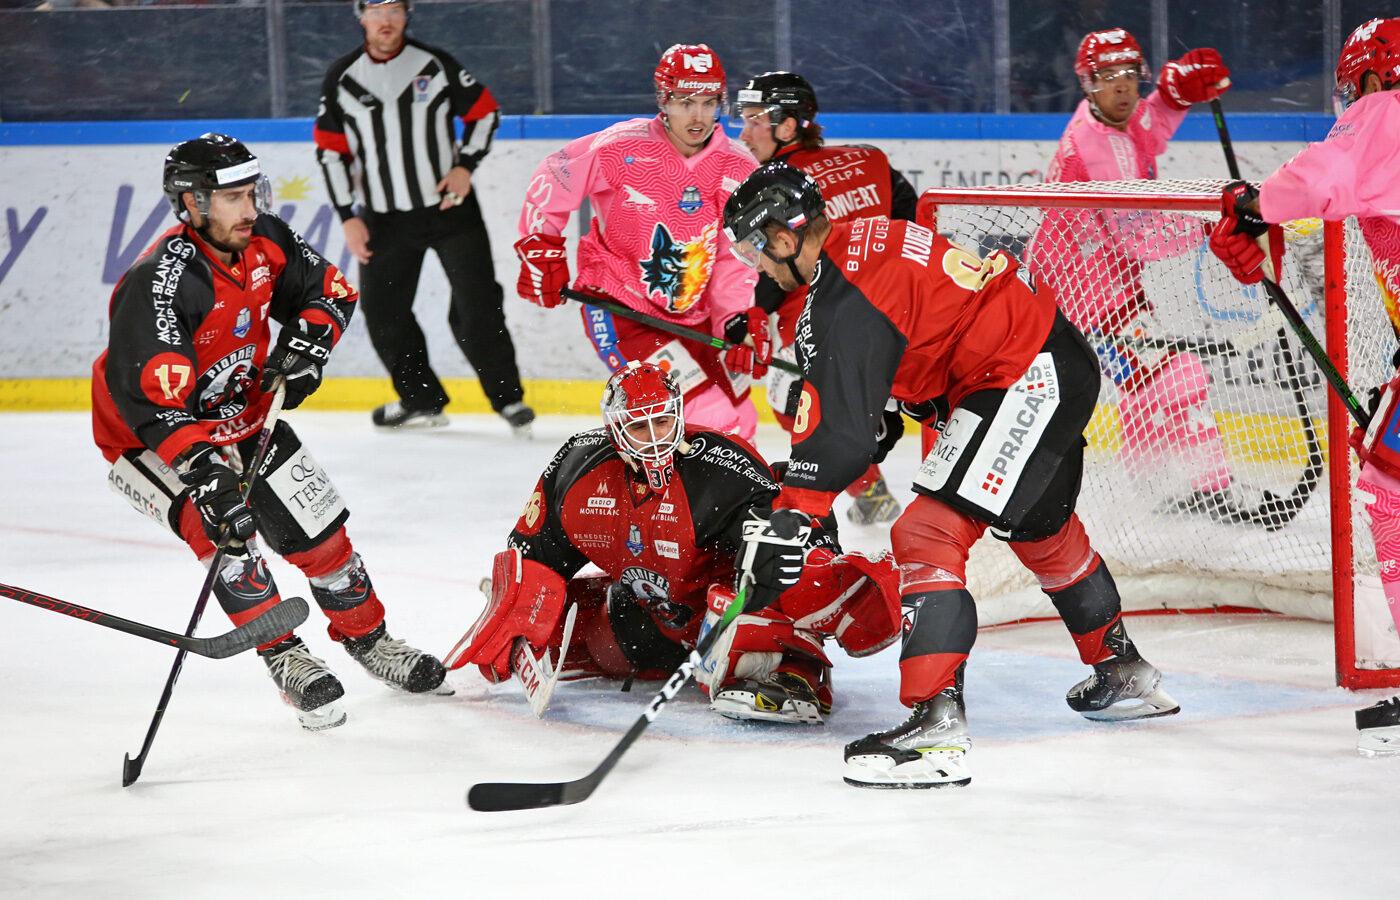 Chamonix tombe à Grenoble